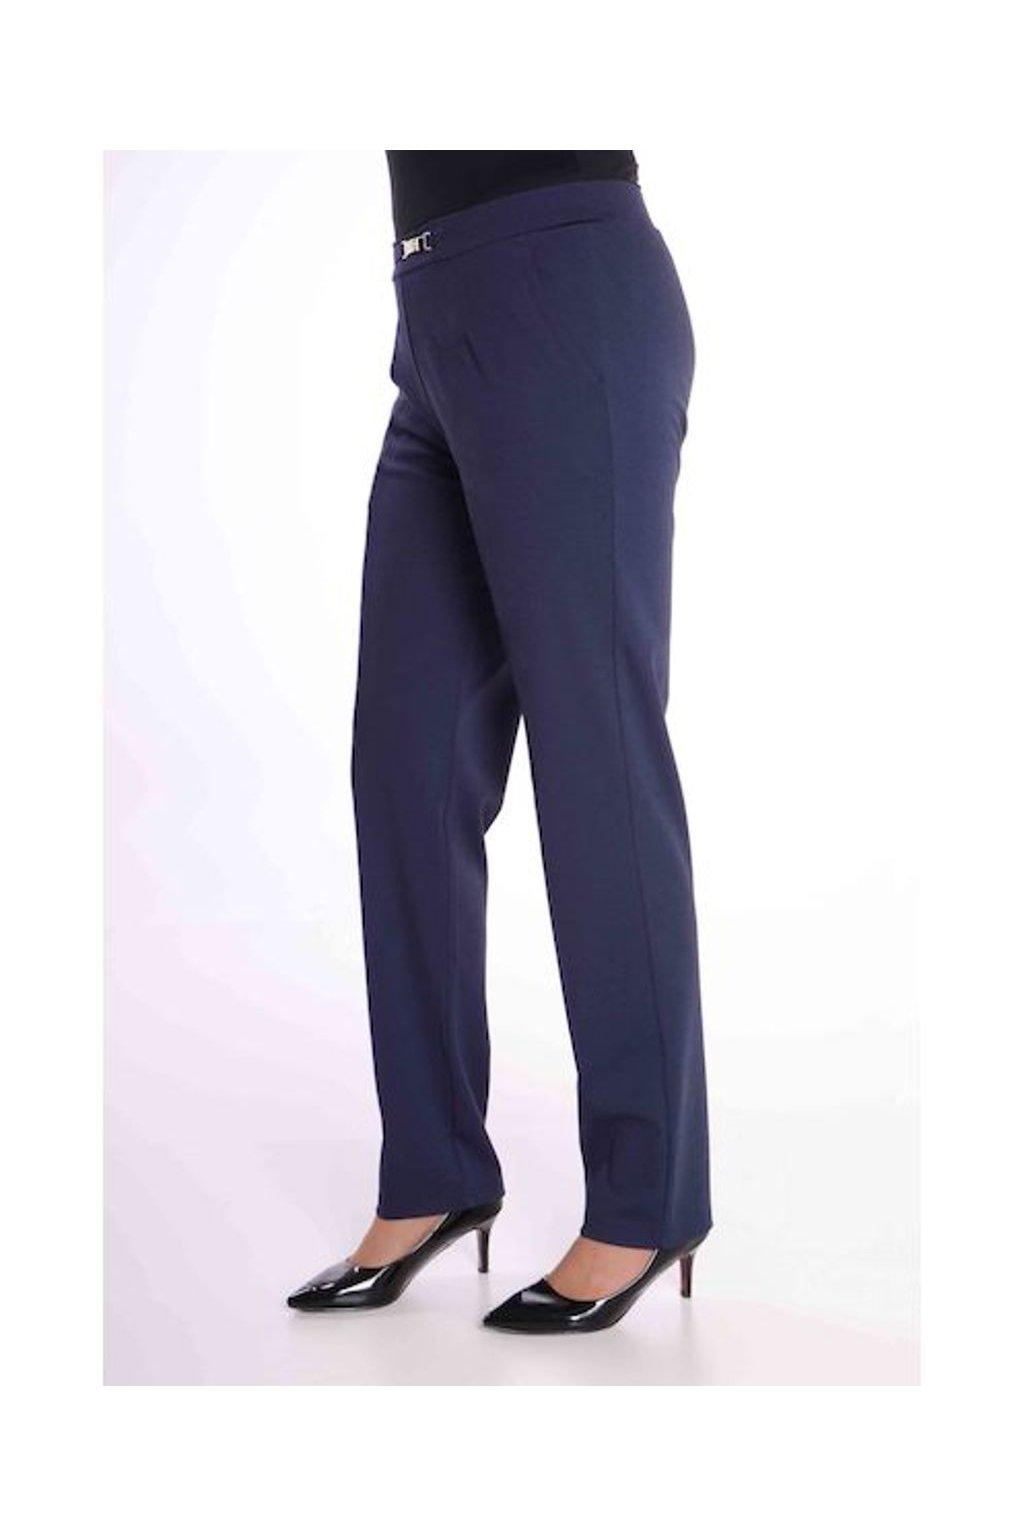 67T Kalhoty Avanti (Velikost 36, Barva Modrá)